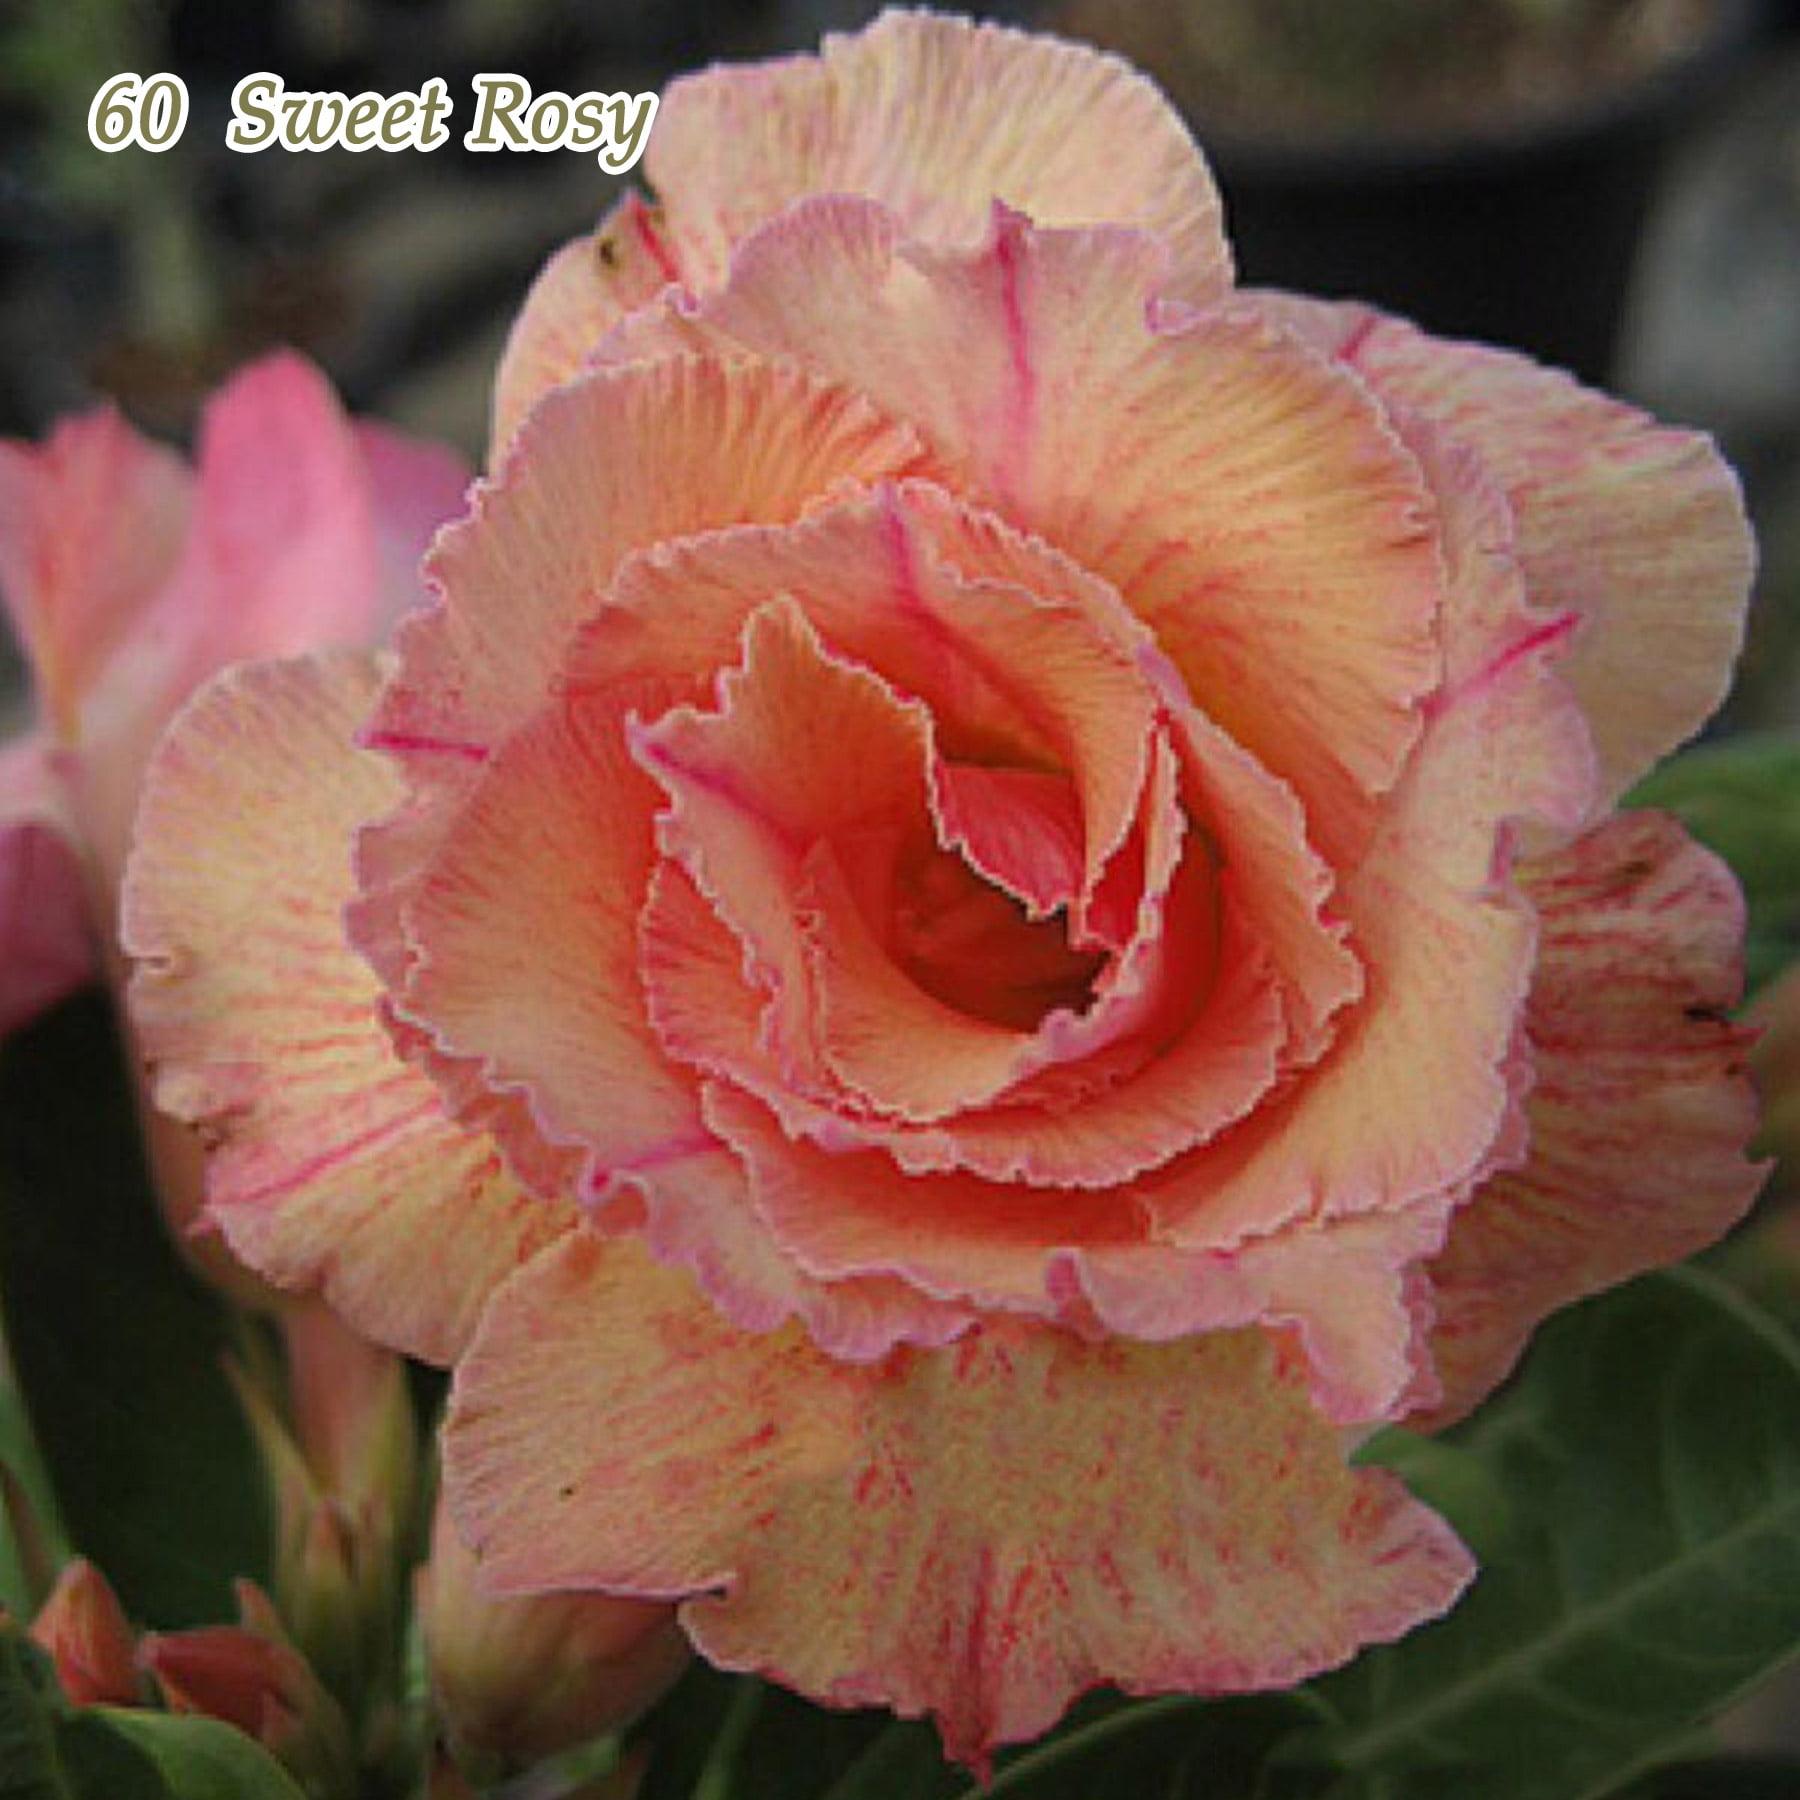 Desert Rose Plant Adenium obesum Mature Bonsai New Hybrids Easy Care by Bonsai Trees